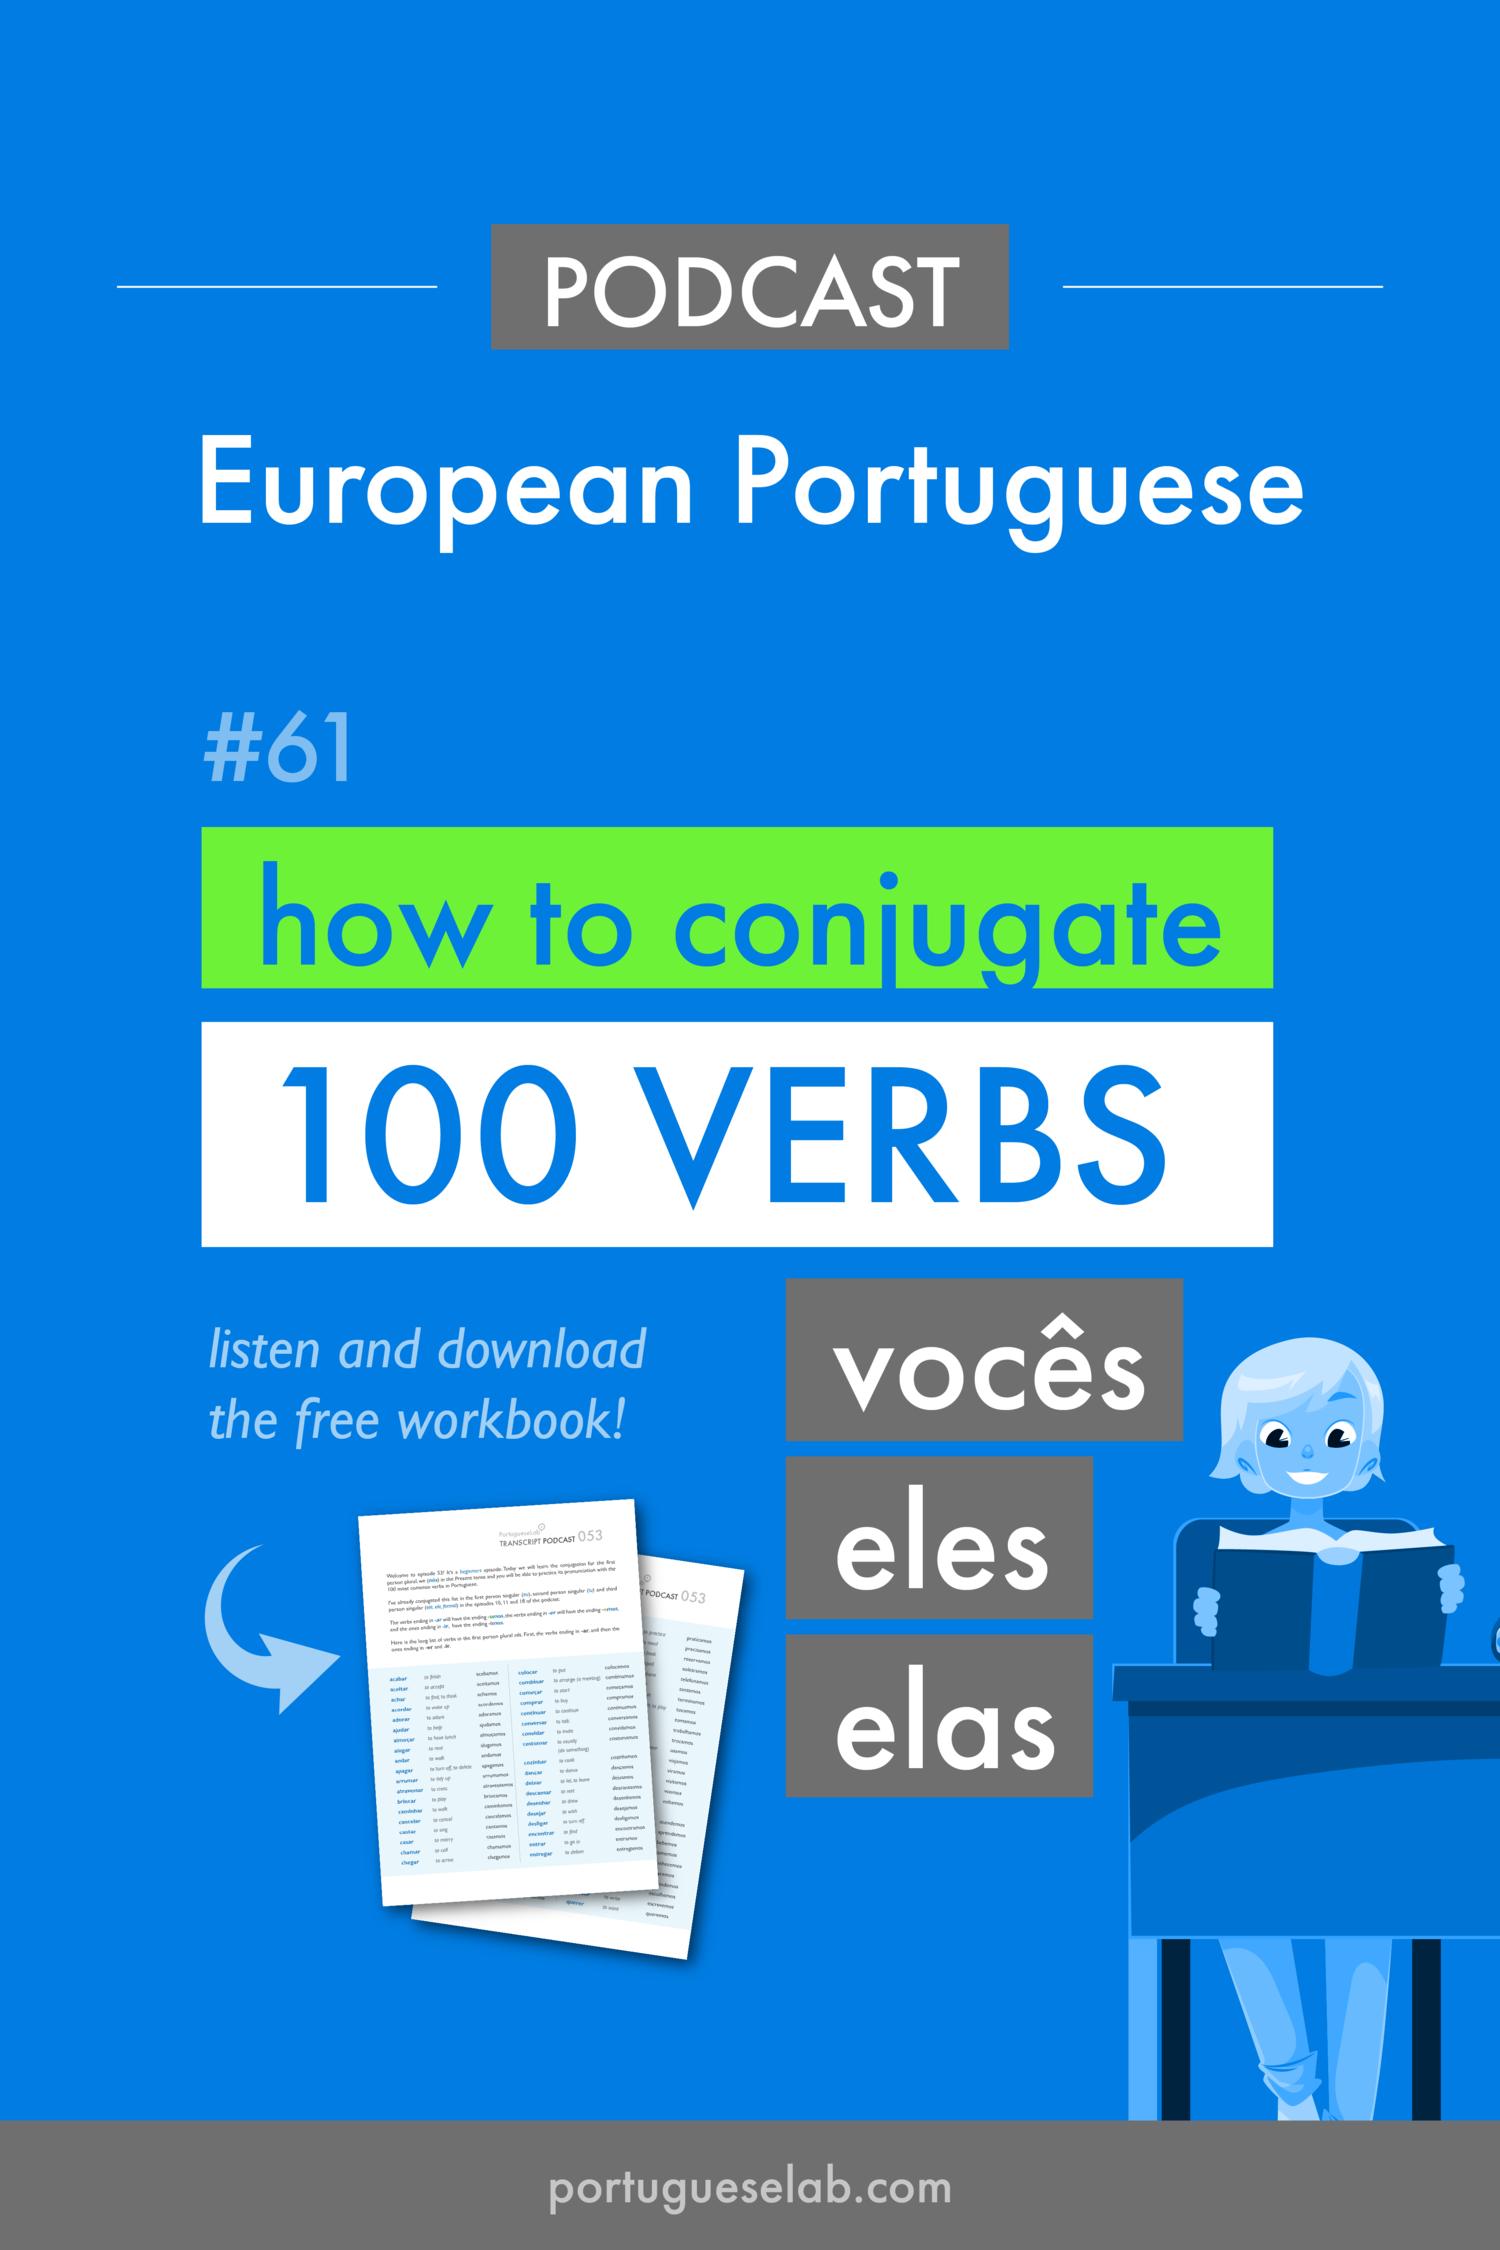 Plp 061 Beginners Basic 100 Verbs In Portuguese Vocês Eles